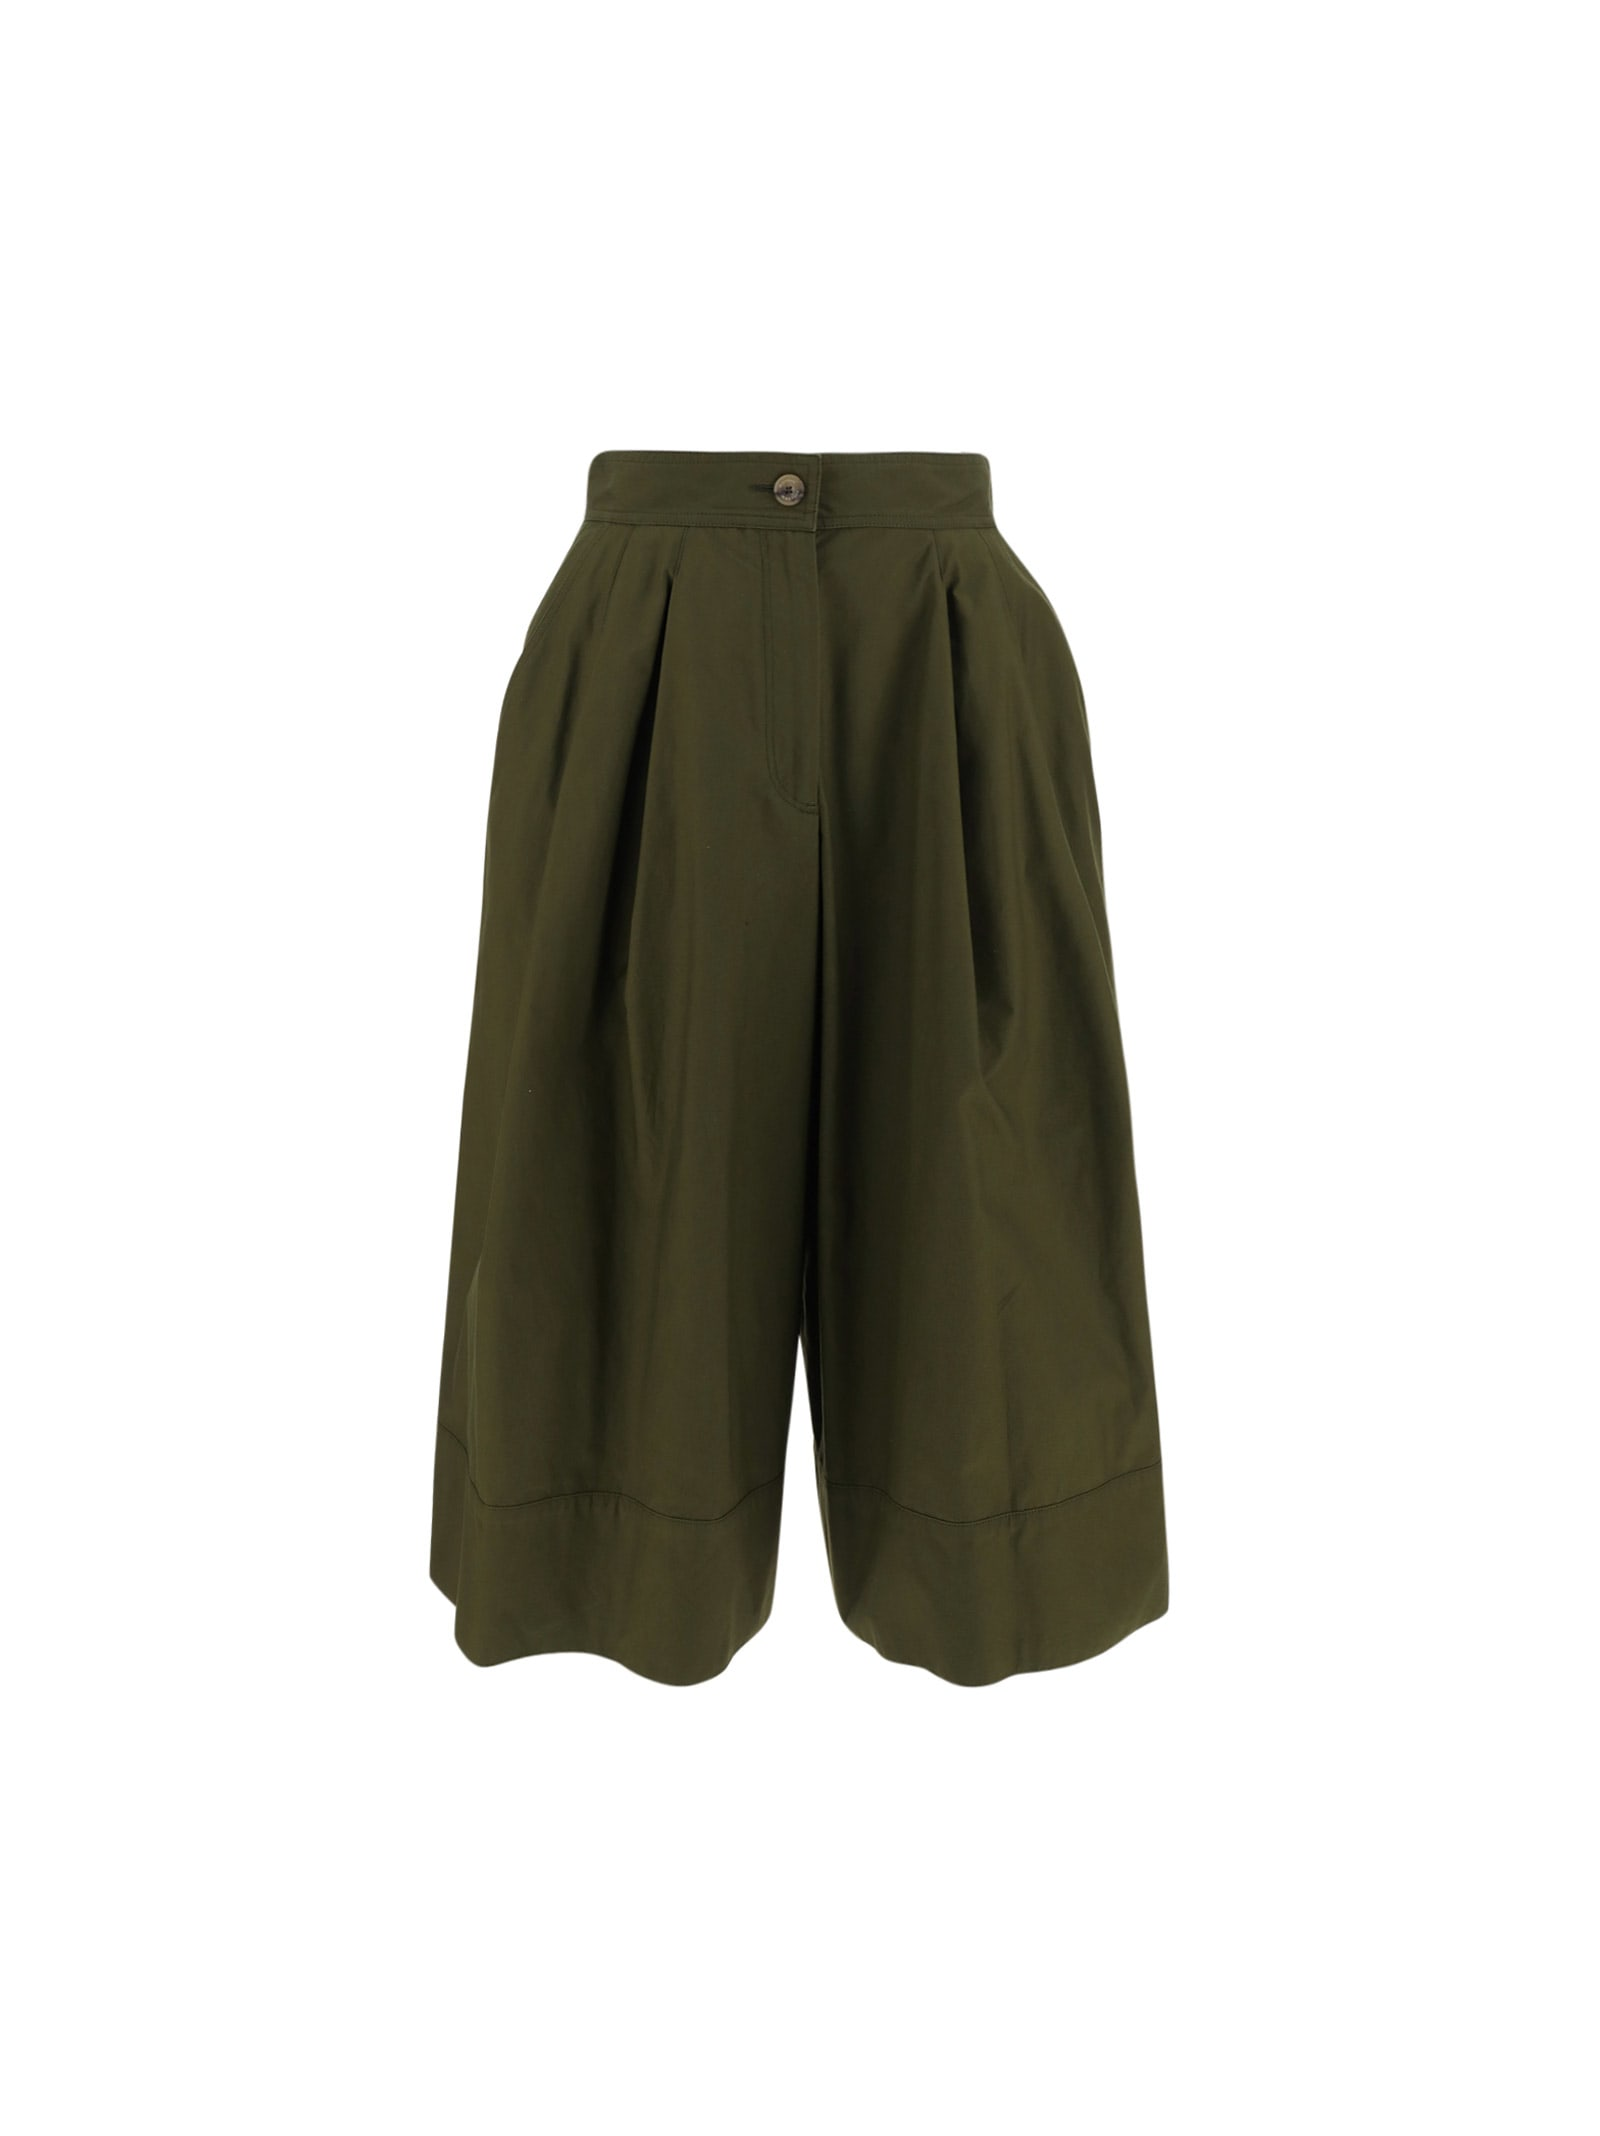 Moncler Cottons X JW ANDERSON BERMUDA SHORTS